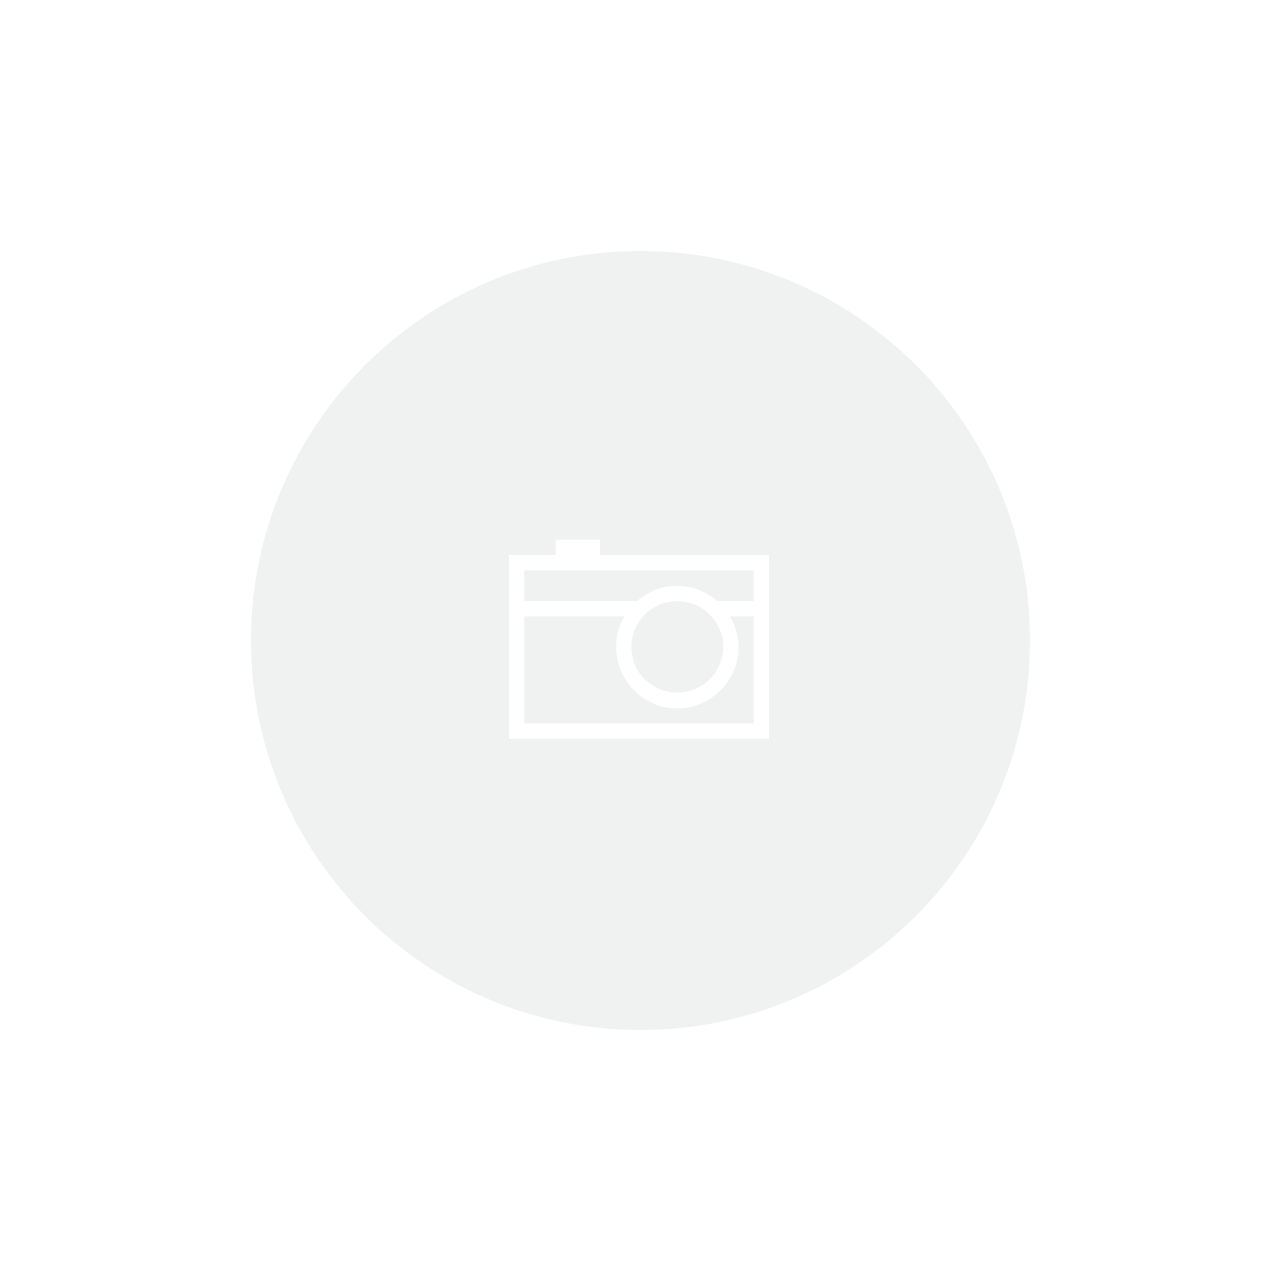 Papel Artesanal Indiano - Ref. 98